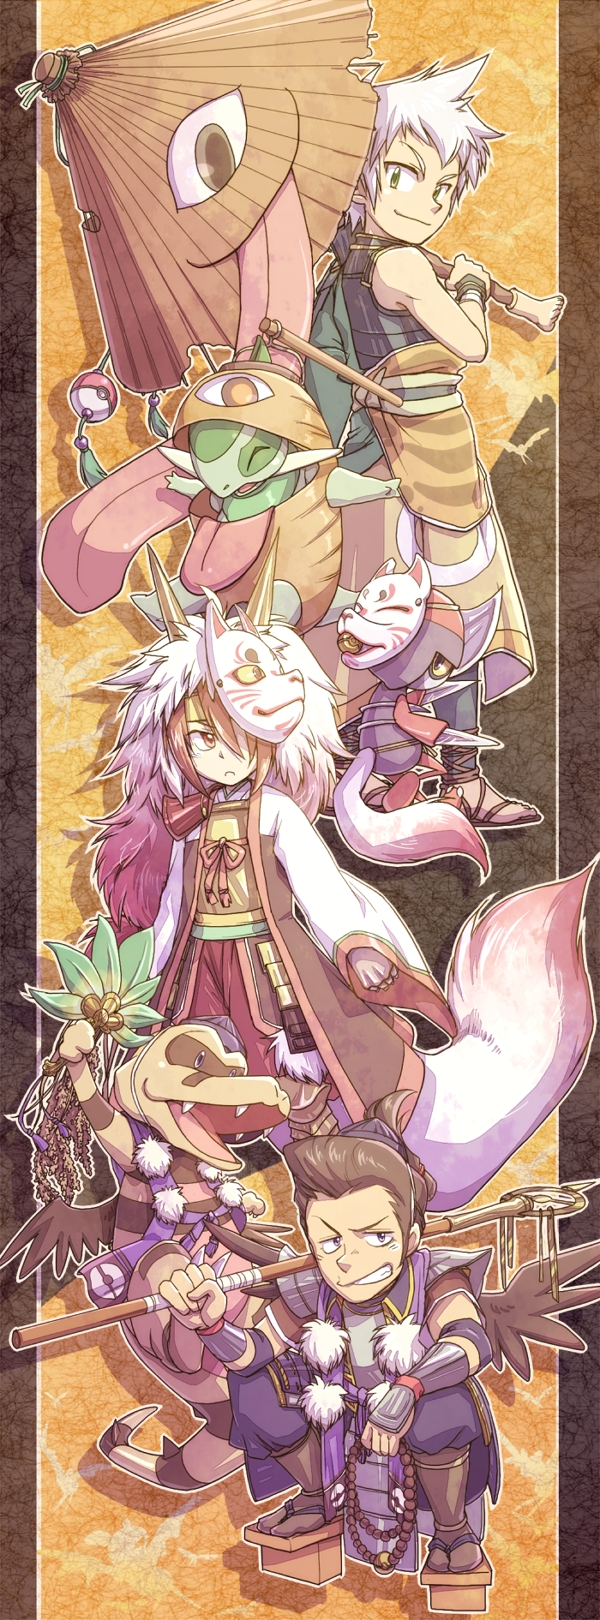 Tags: Anime, Pokémon + Nobunaga no Yabou, Pokémon, Pawniard, Ishida Mitsunari (Nobunaga's Ambition), Krokorok, Fukushima Masanori (Nobunaga's Ambition), Katou Kiyomasa (Nobunaga's Ambition), Axew, Pixiv, Fanart, Fanart From Pixiv, Pokémon Conquest